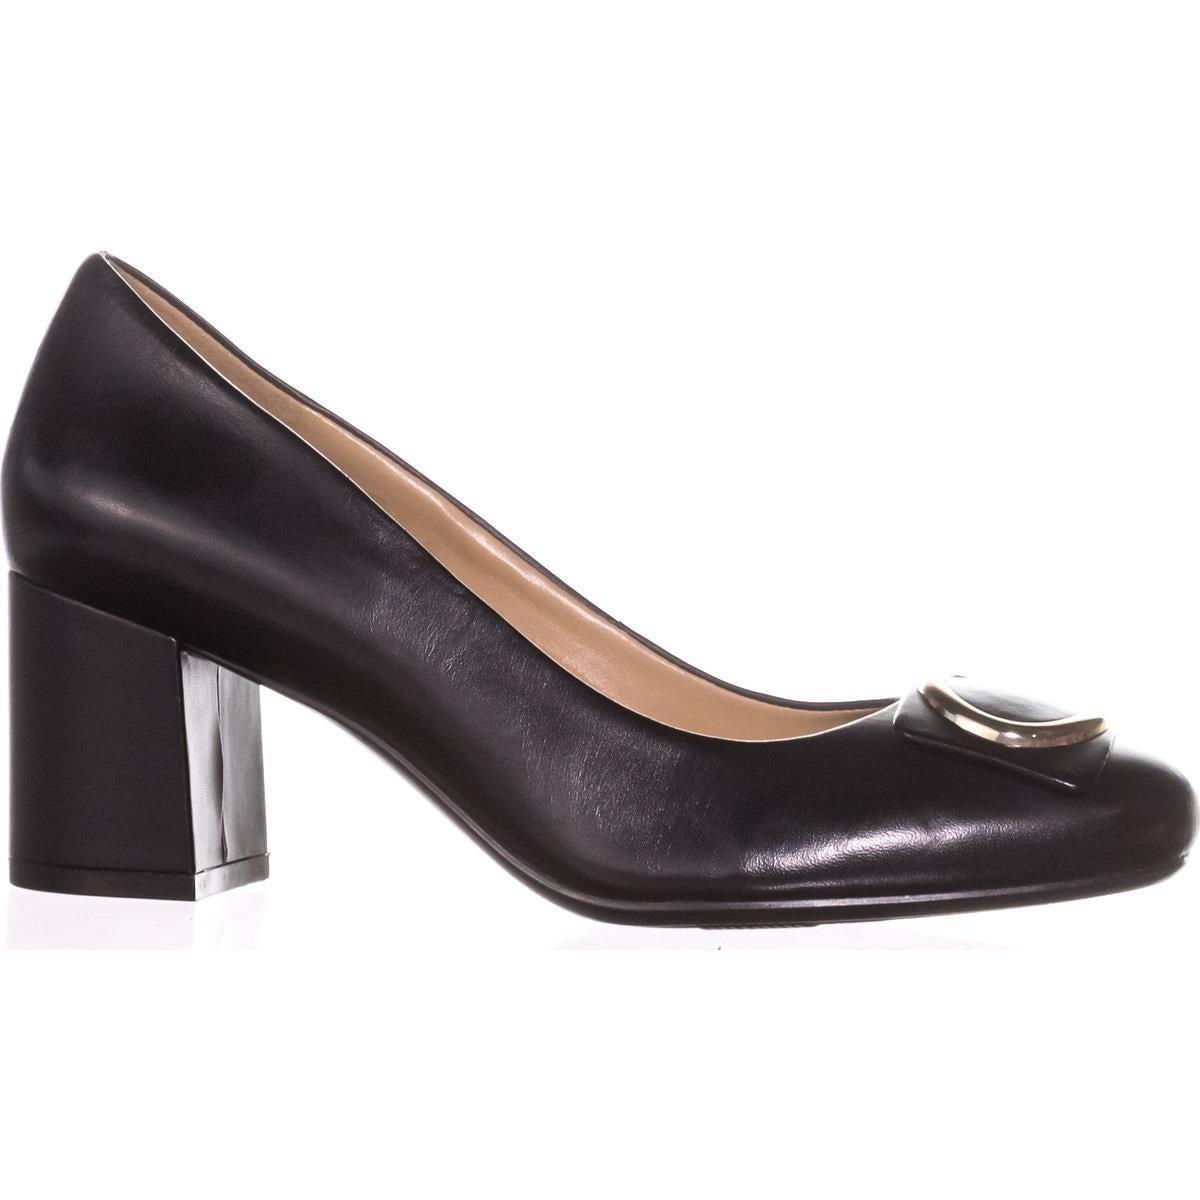 Naturalizer Wright Block Heel Pump(Women's) -Platina Leather